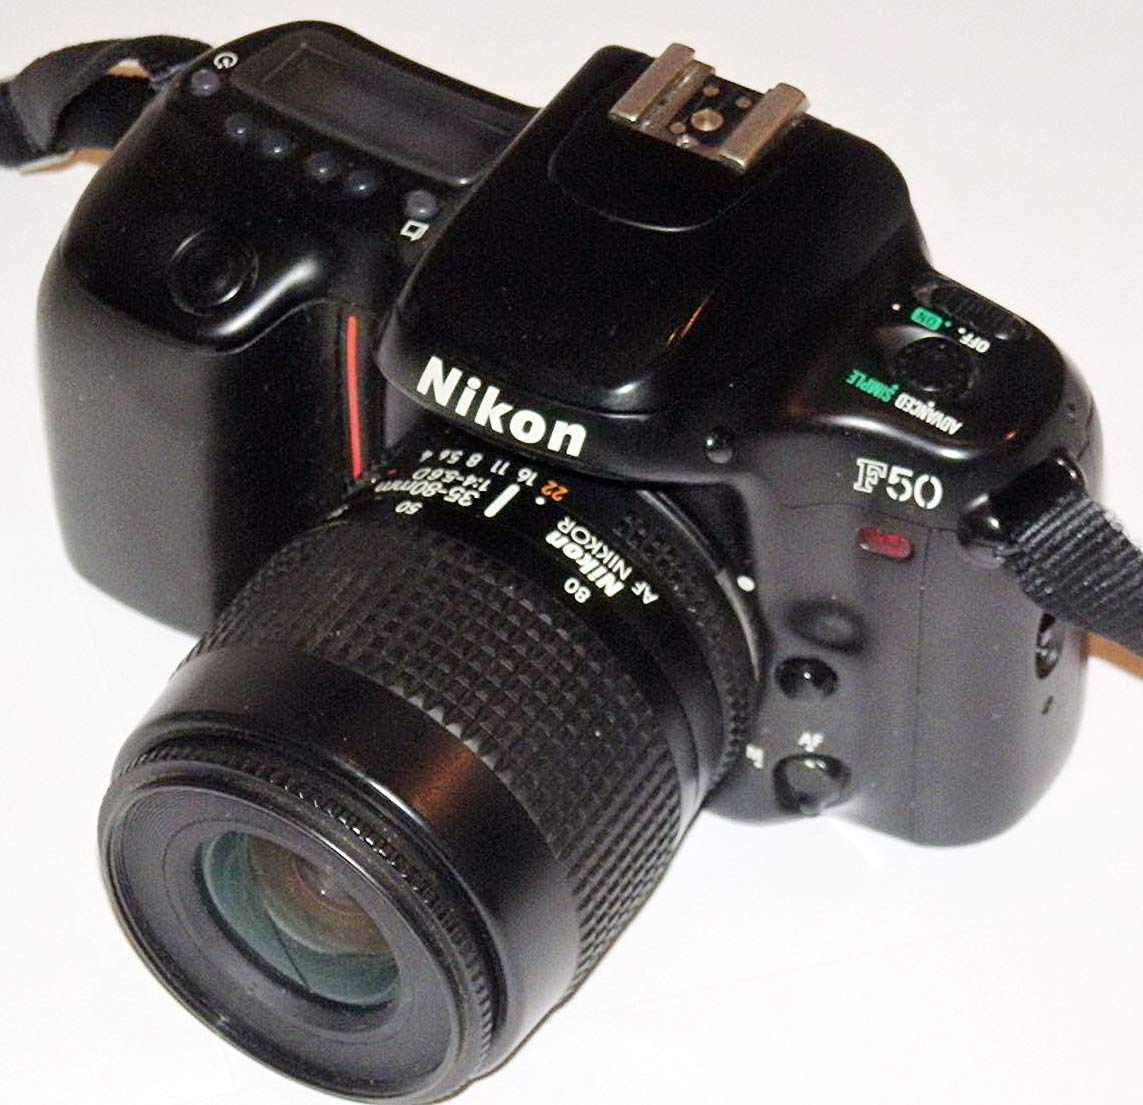 Fotos – Nikon F50 – SLR Camera inclusive Objetivo Nikon AF Nikkor ...